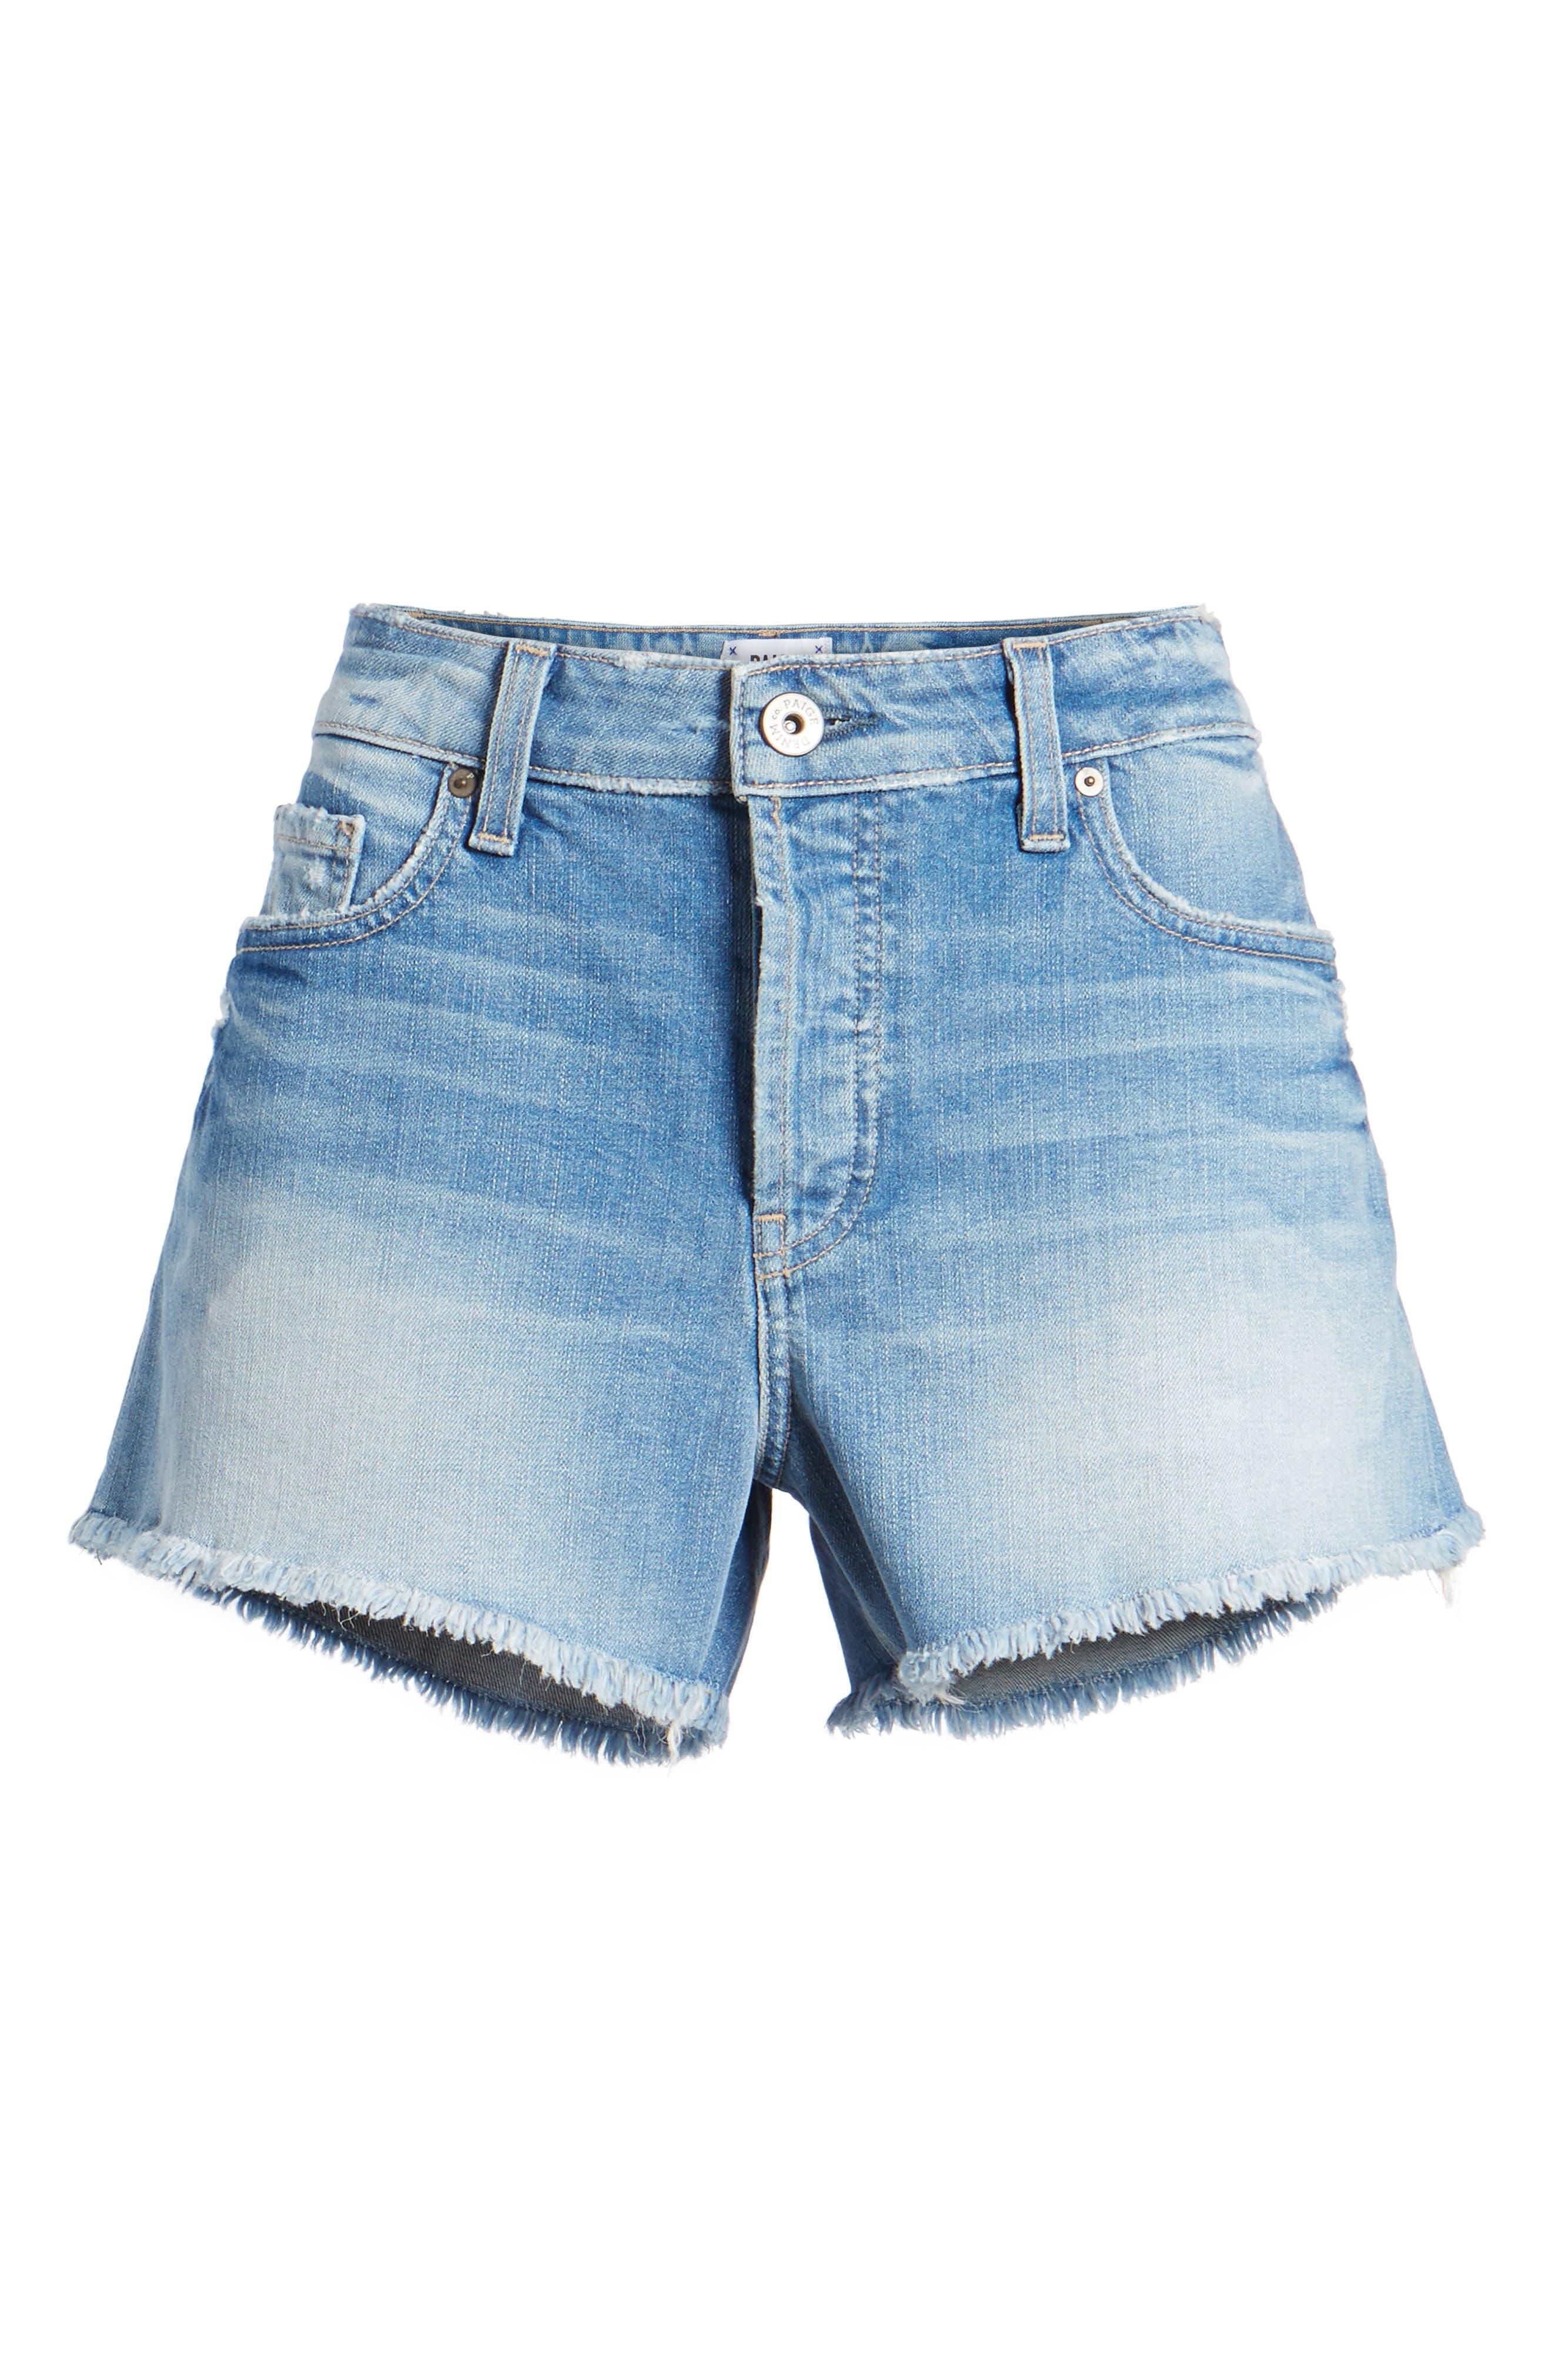 Emmitt High Waist Cutoff Denim Shorts,                             Alternate thumbnail 7, color,                             Janis Destructed